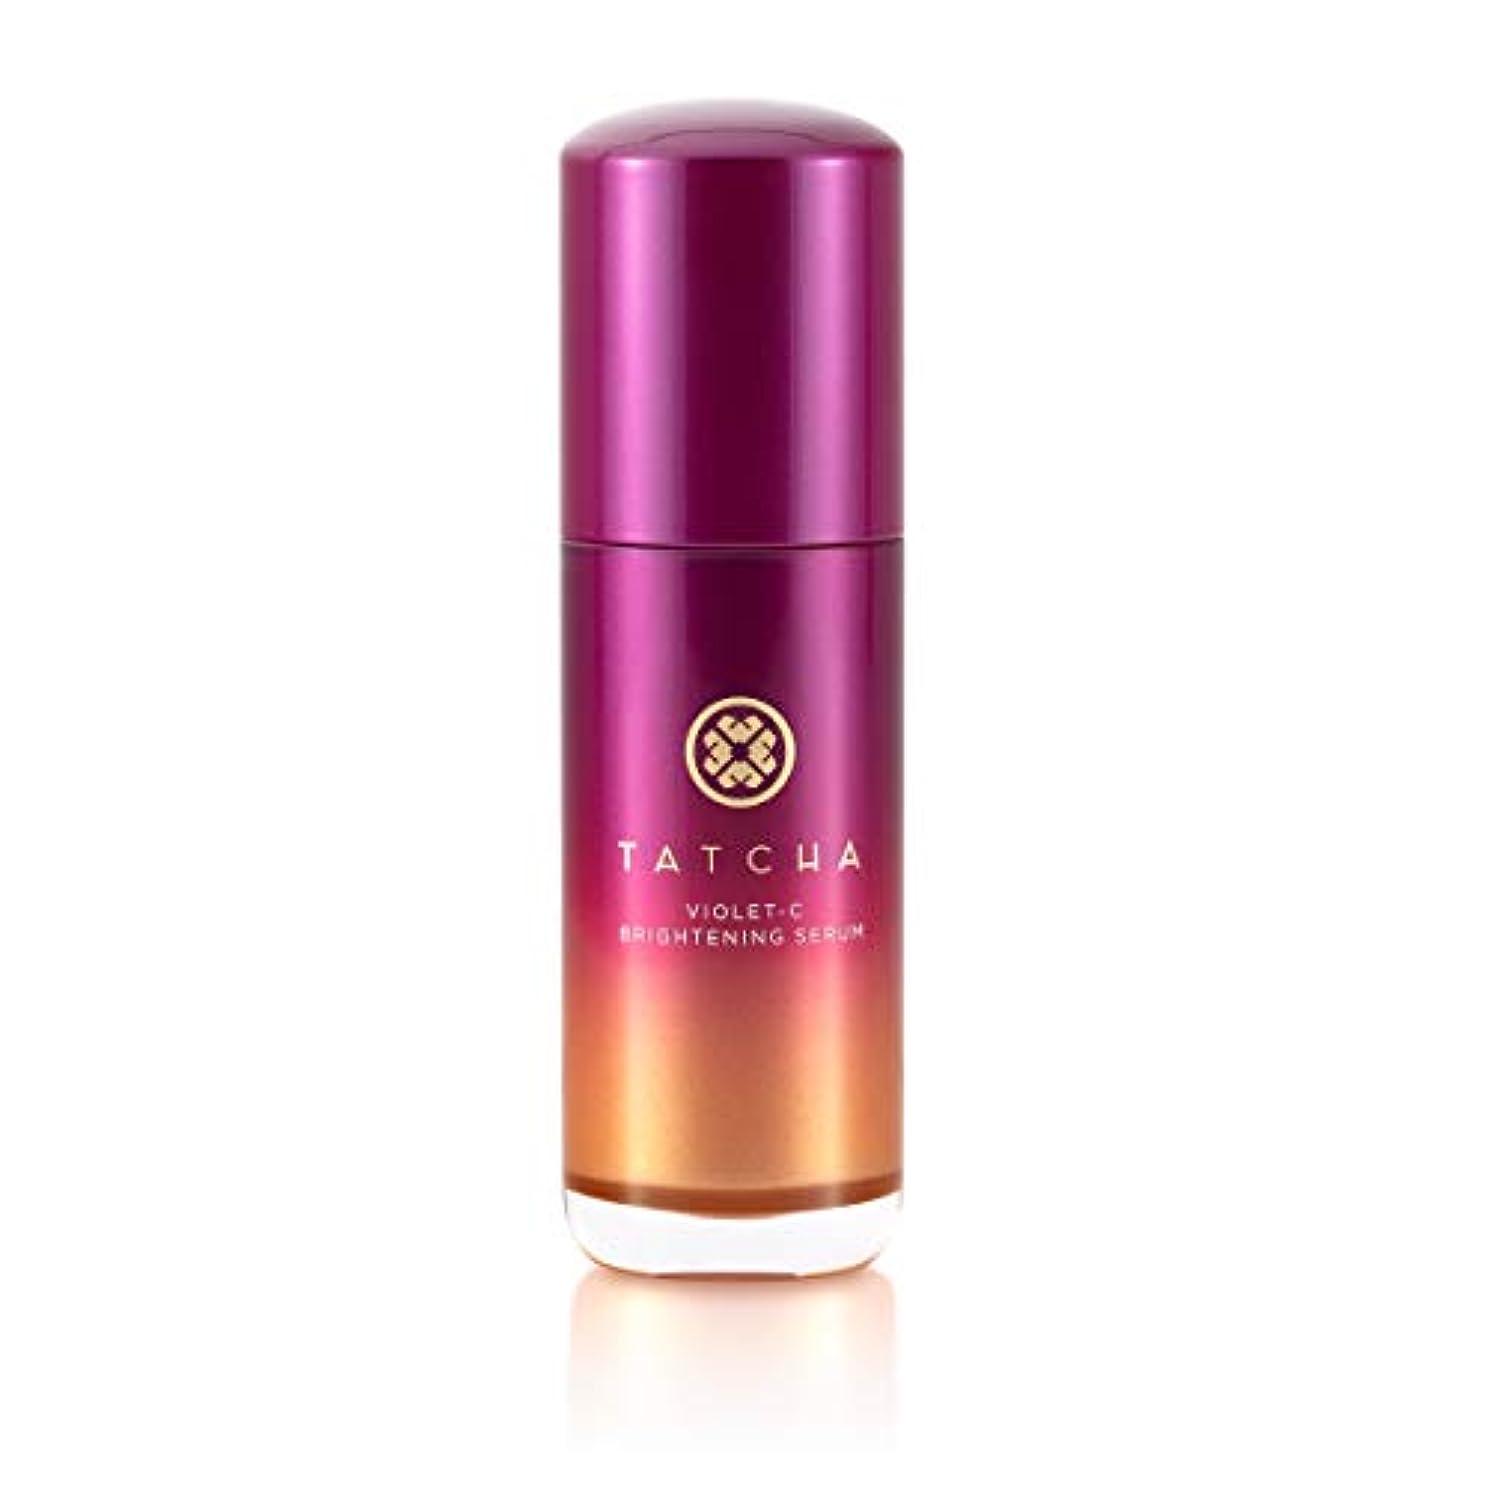 TATCHA Violet-C Brightening Serum (20% Vitamin C + 10% AHA) タチャ バイオレットC ブライトニング セラム 美容液 30ml